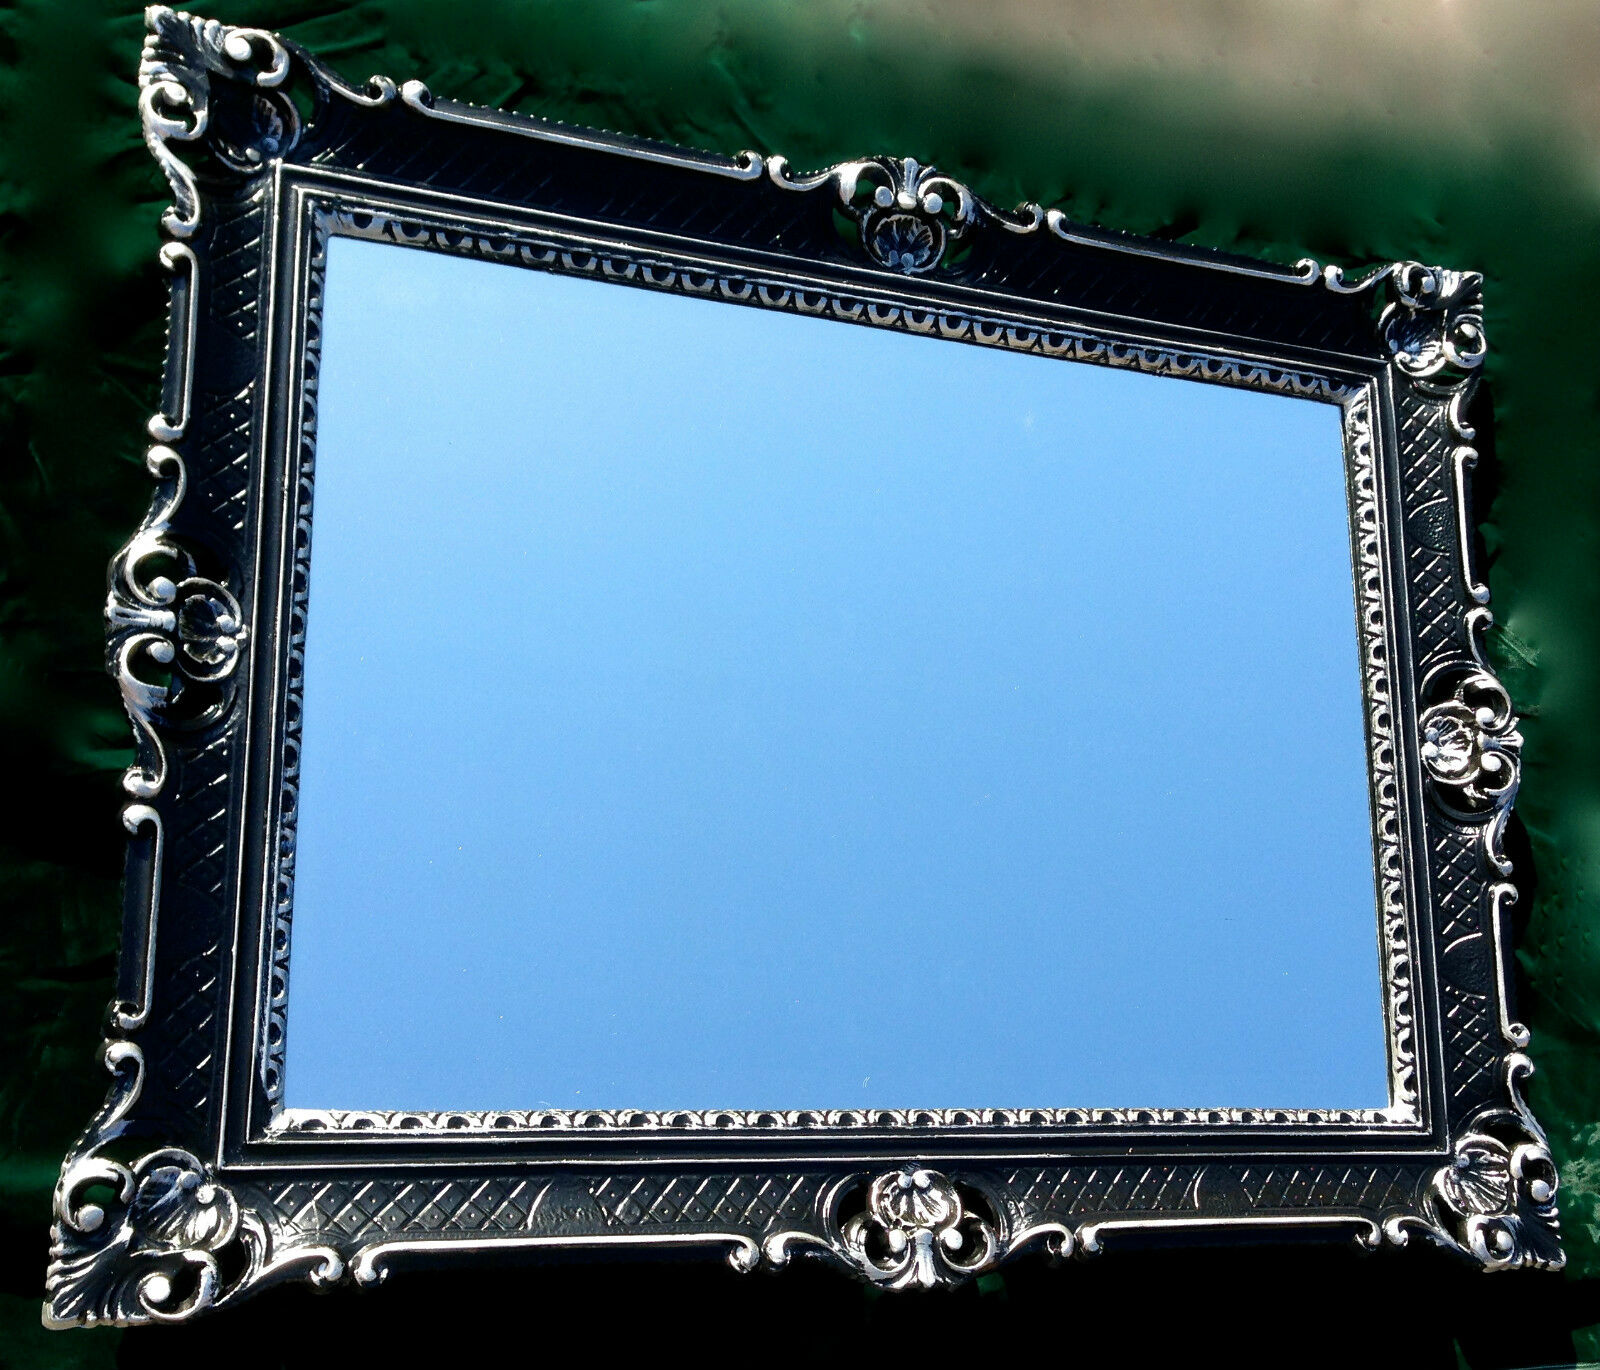 wandspiegel barock rechteckig spiegel antik wanddeko schwarz silber 90x70cm eur 89 00. Black Bedroom Furniture Sets. Home Design Ideas